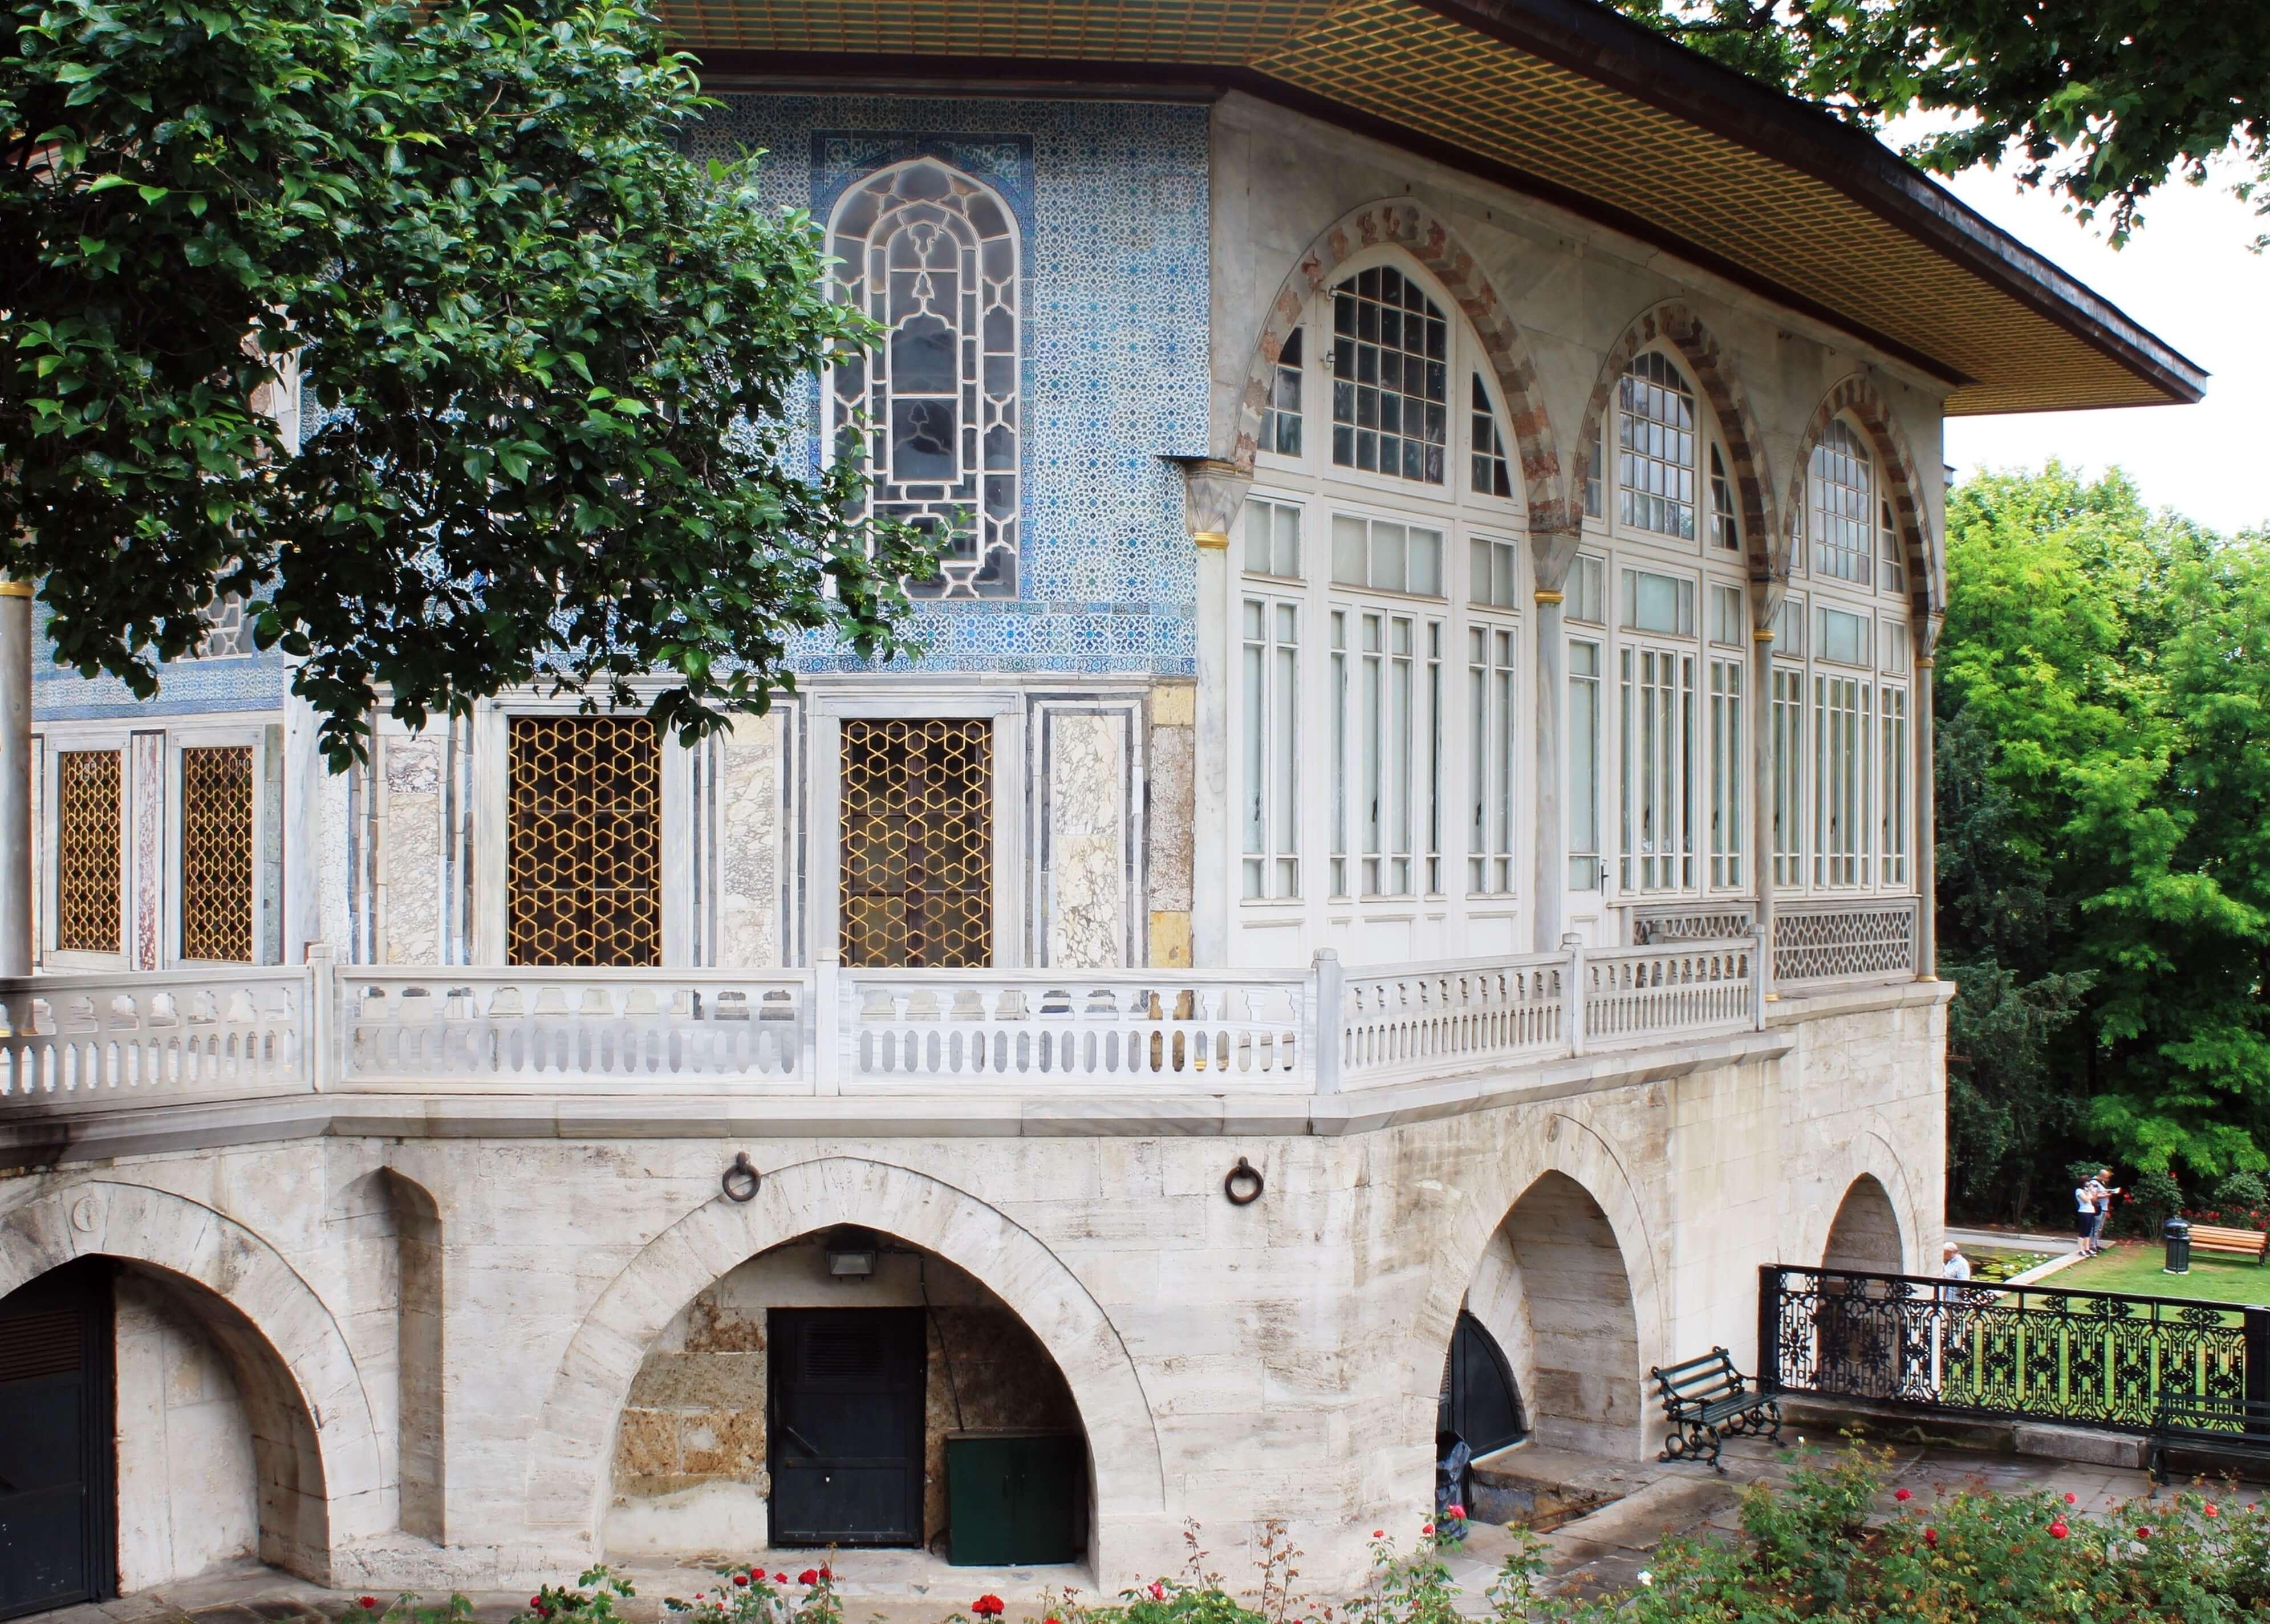 The Baghdad Pavilion_Topkapi 4th Courtyard